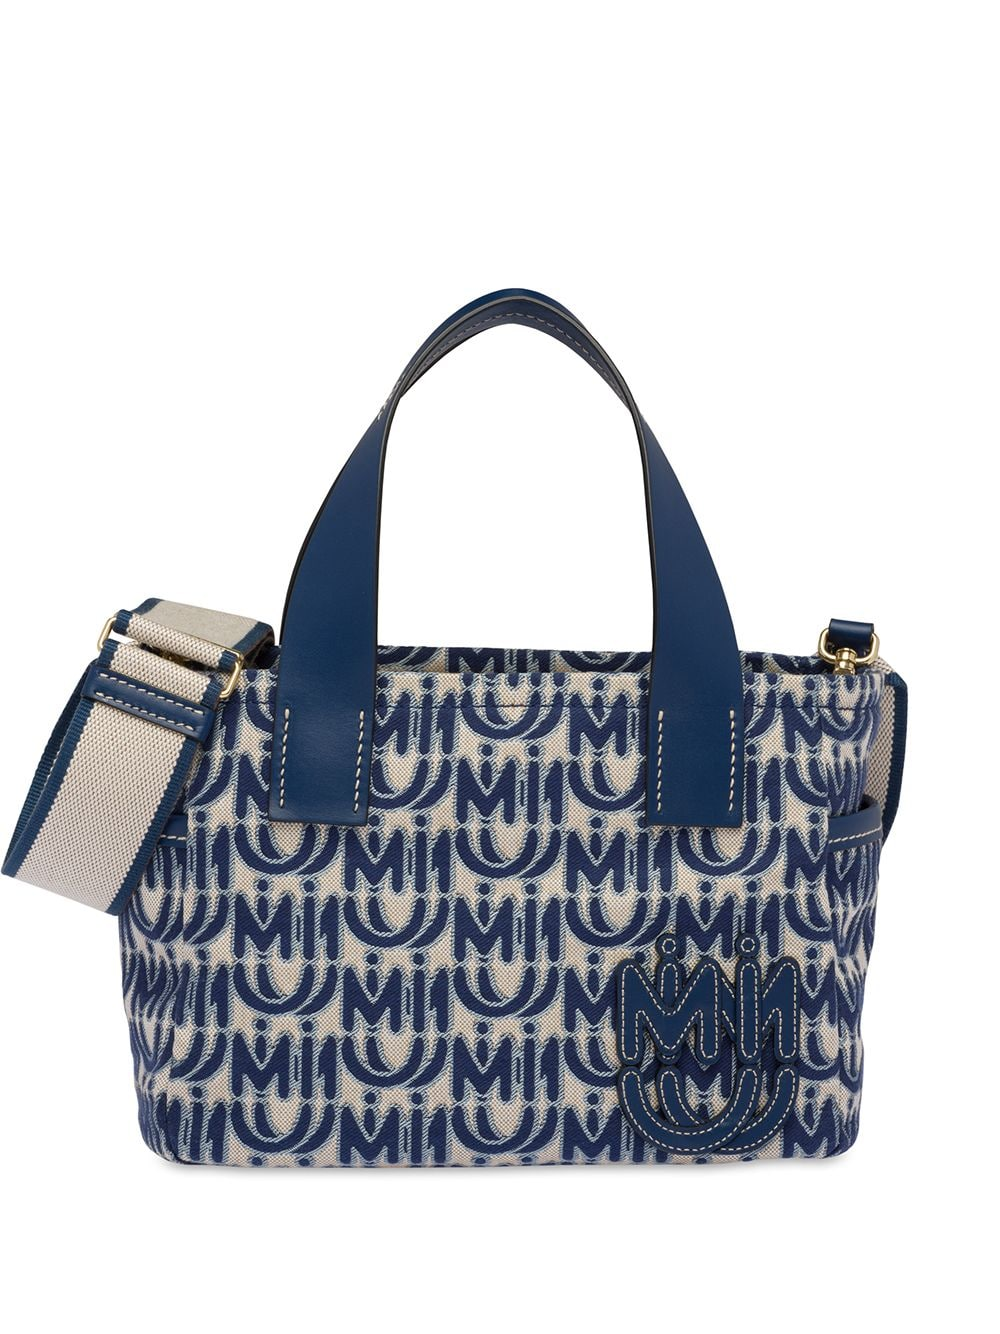 Miu Miu Handtasche mit Logo - Blau